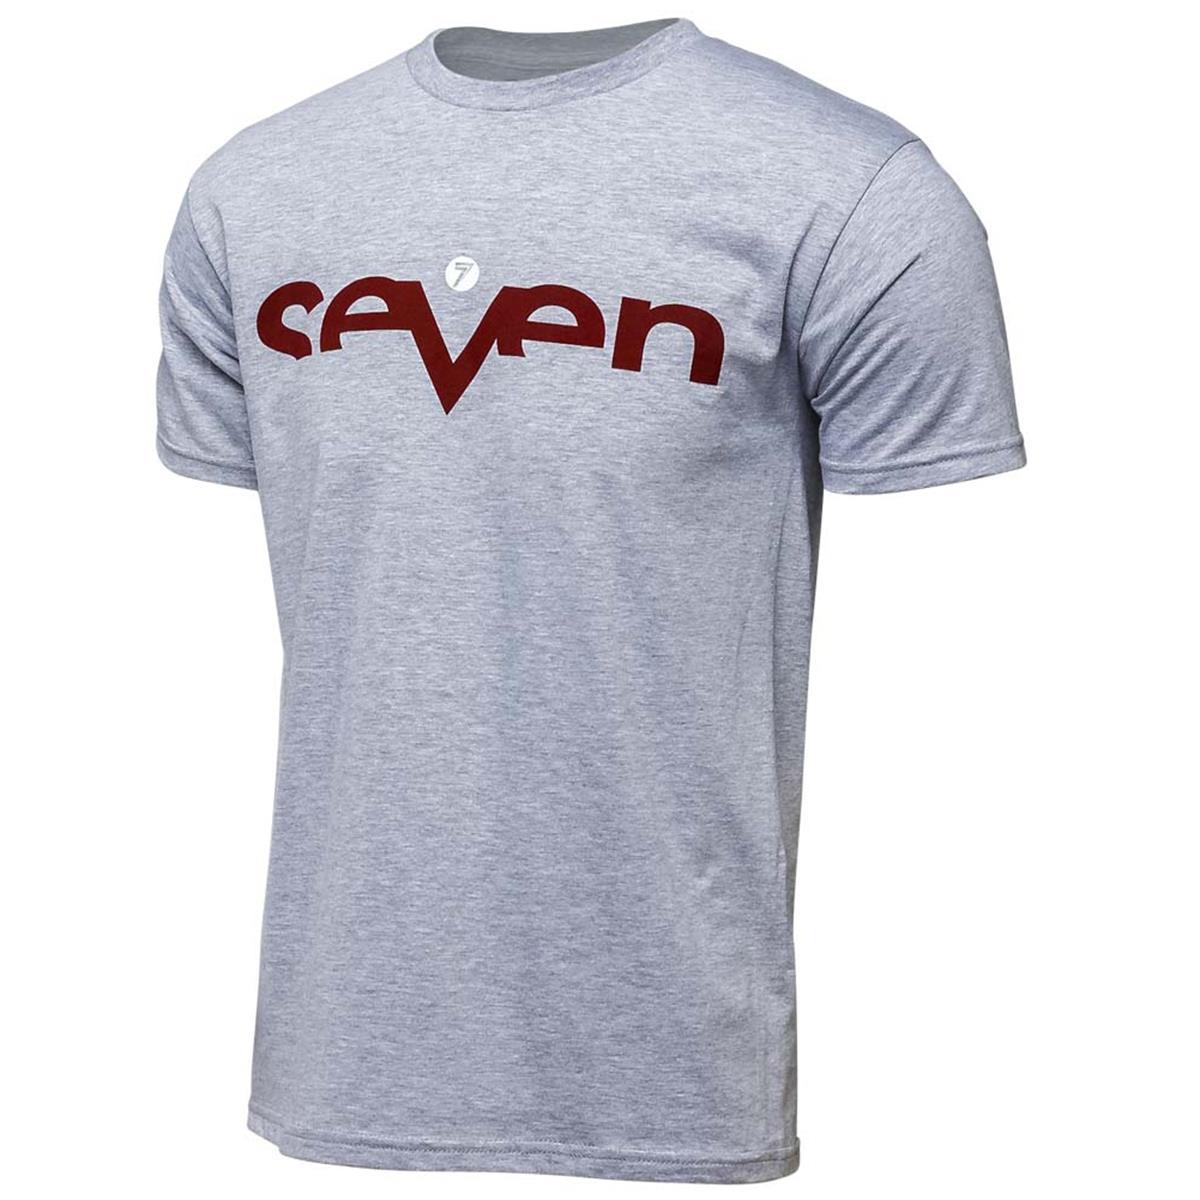 Seven MX T-Shirt Brand 2.0 Grey Burgundy